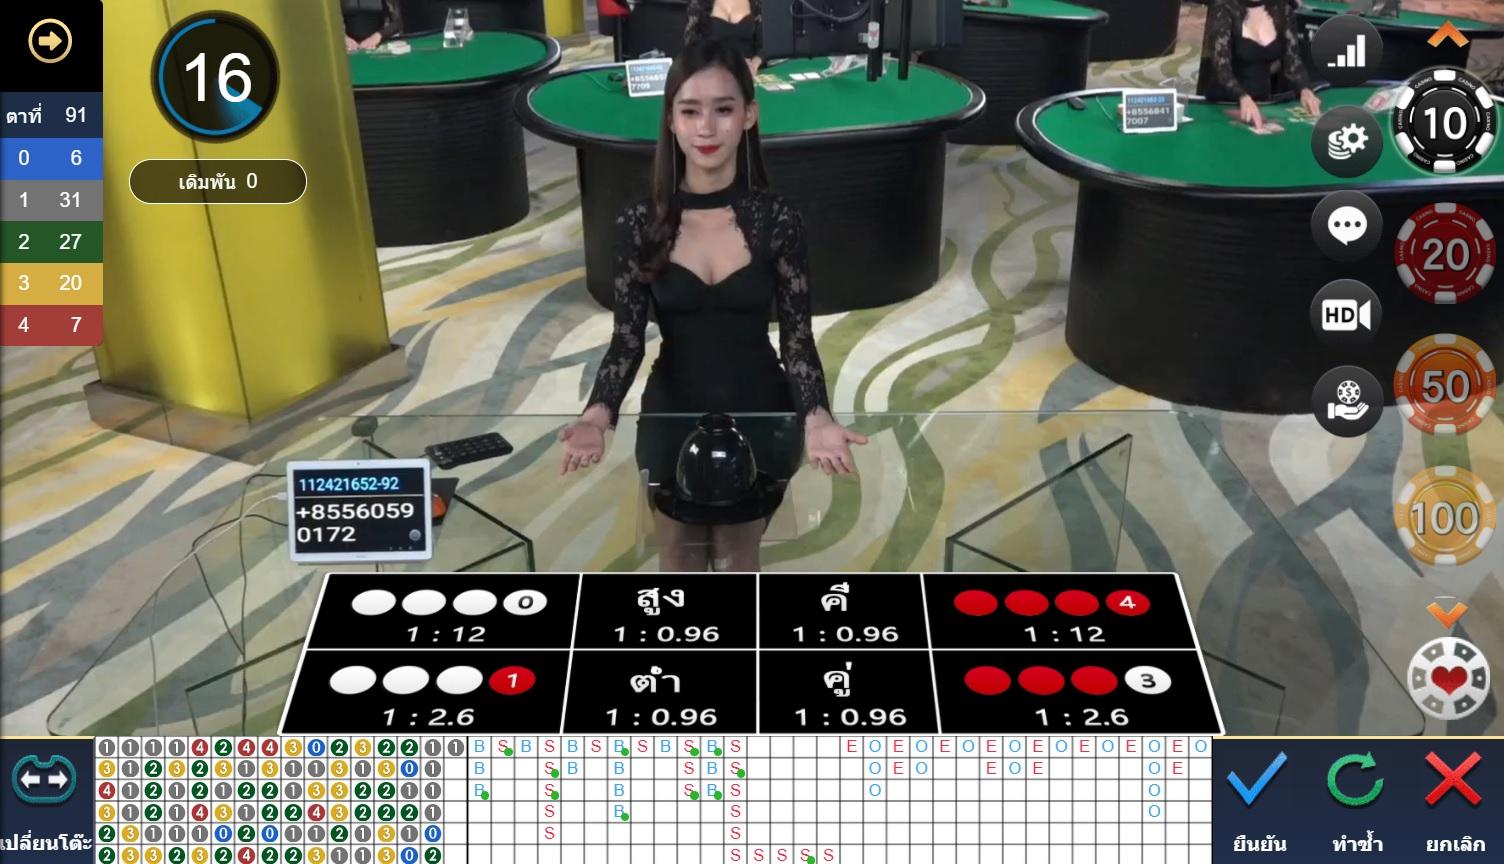 5G88-วิธีการแทงซ๊อกเดียร์ -WM-casino